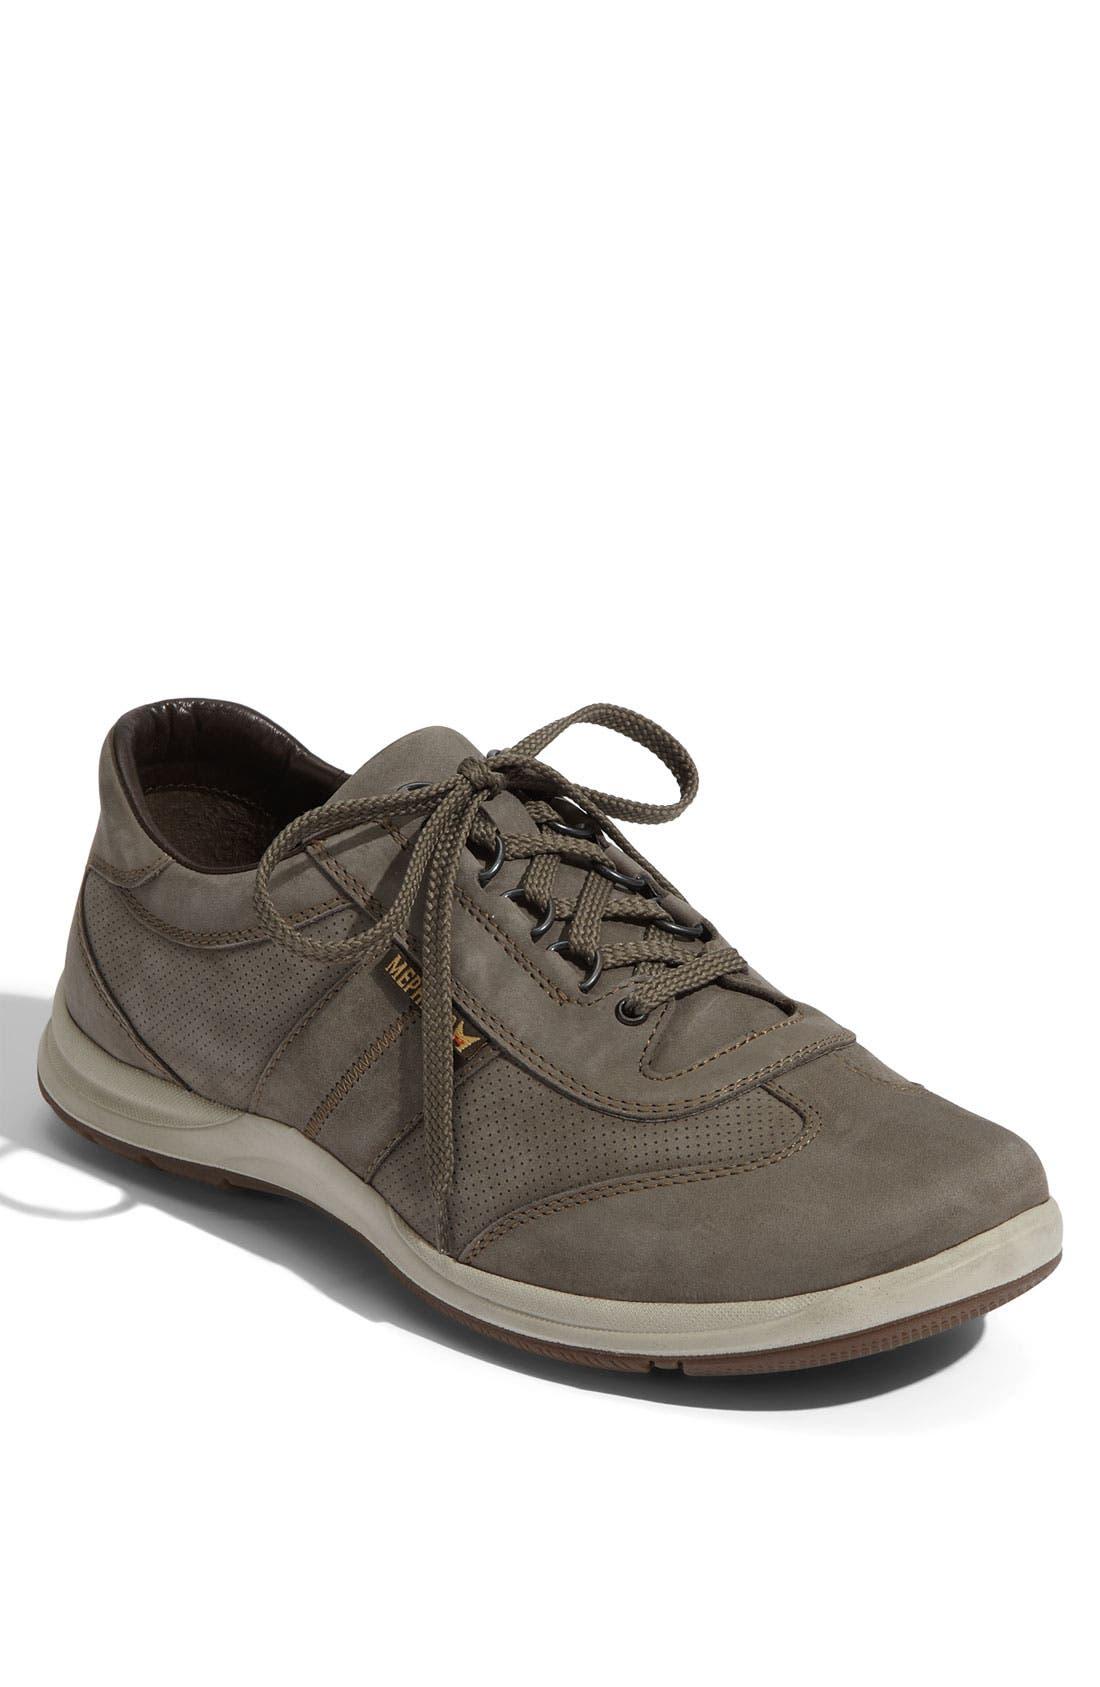 MEPHISTO Hike Perforated Walking Shoe